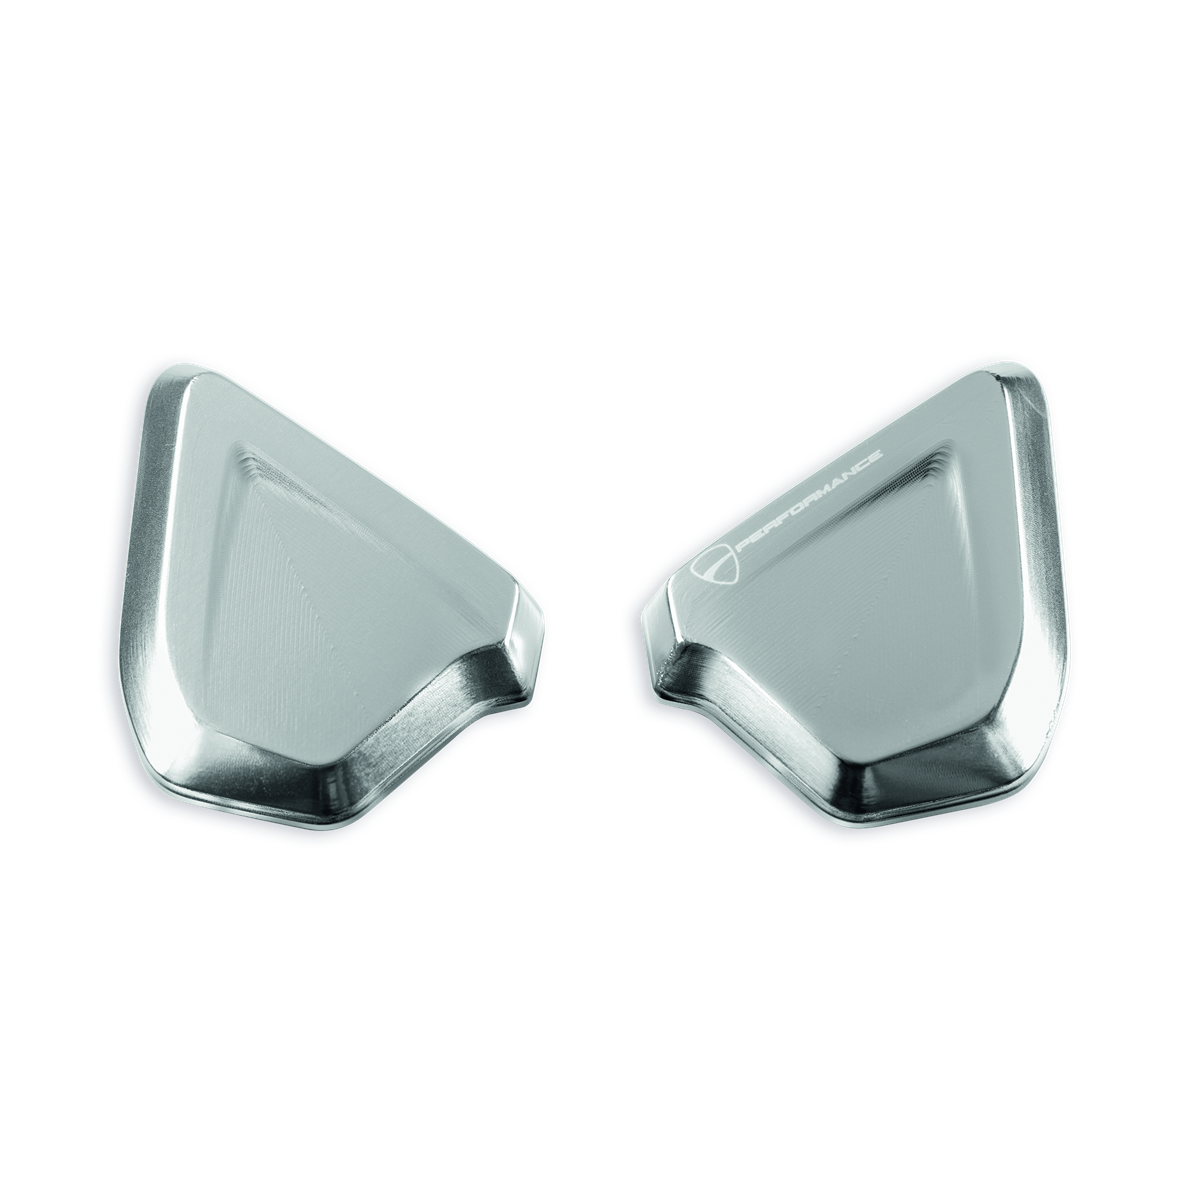 Billet aluminum caps to plug mirror mounting holes.